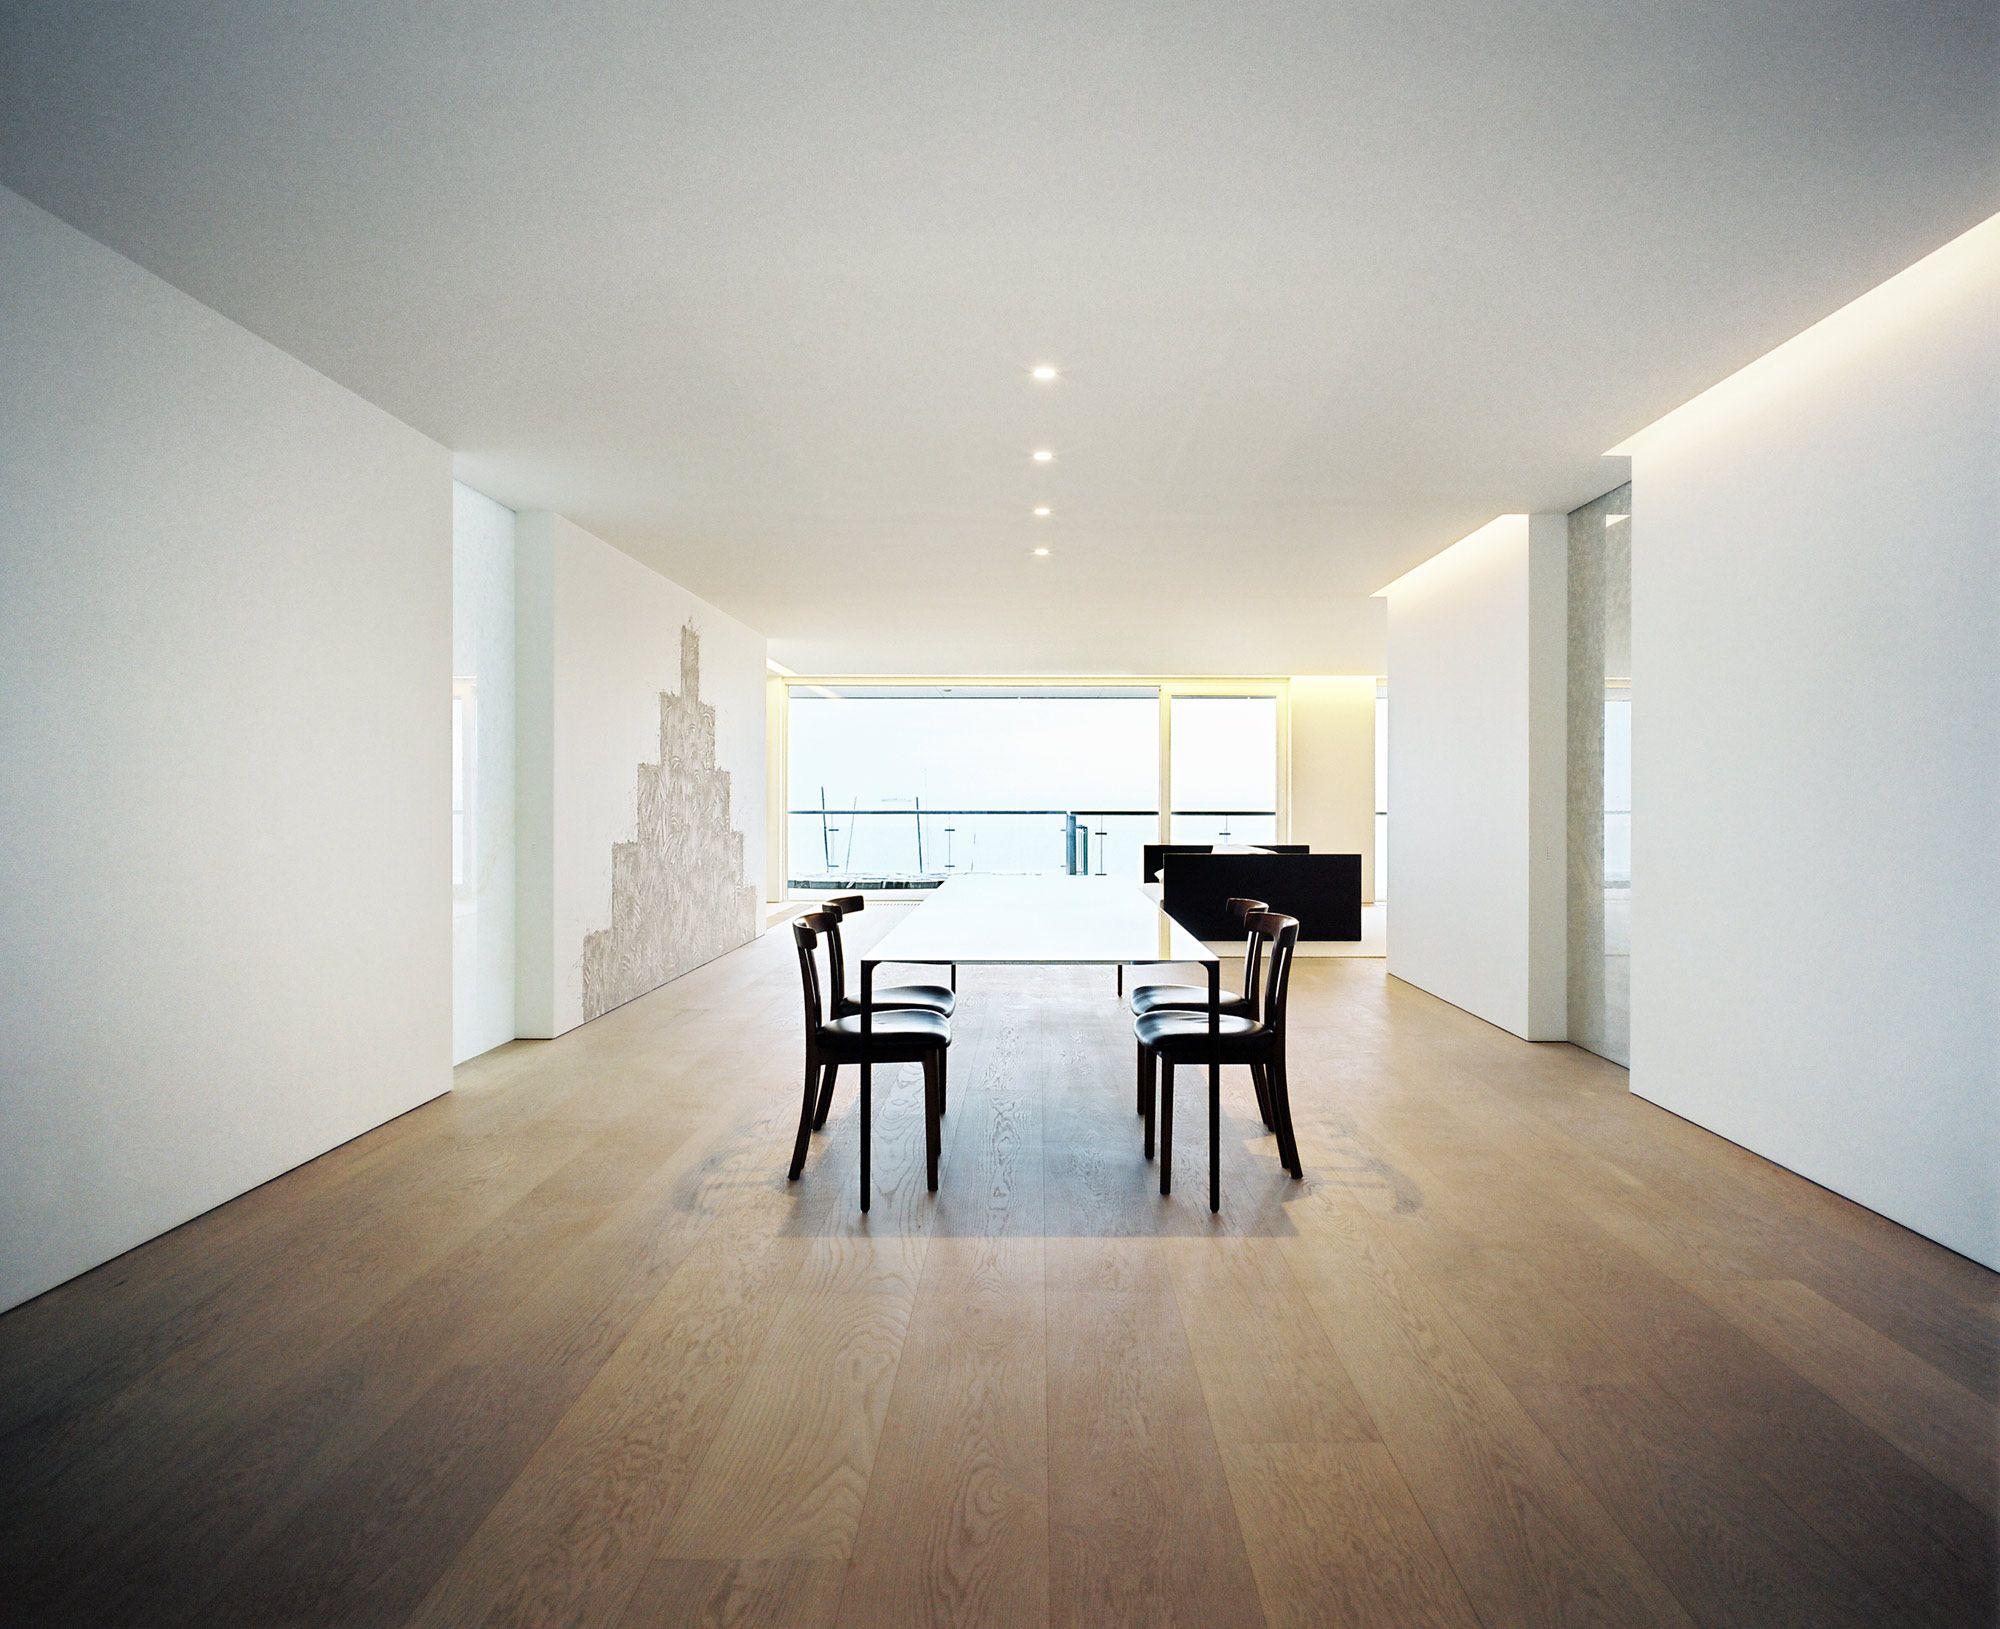 lighting || John Pawson - North Sea Apartment